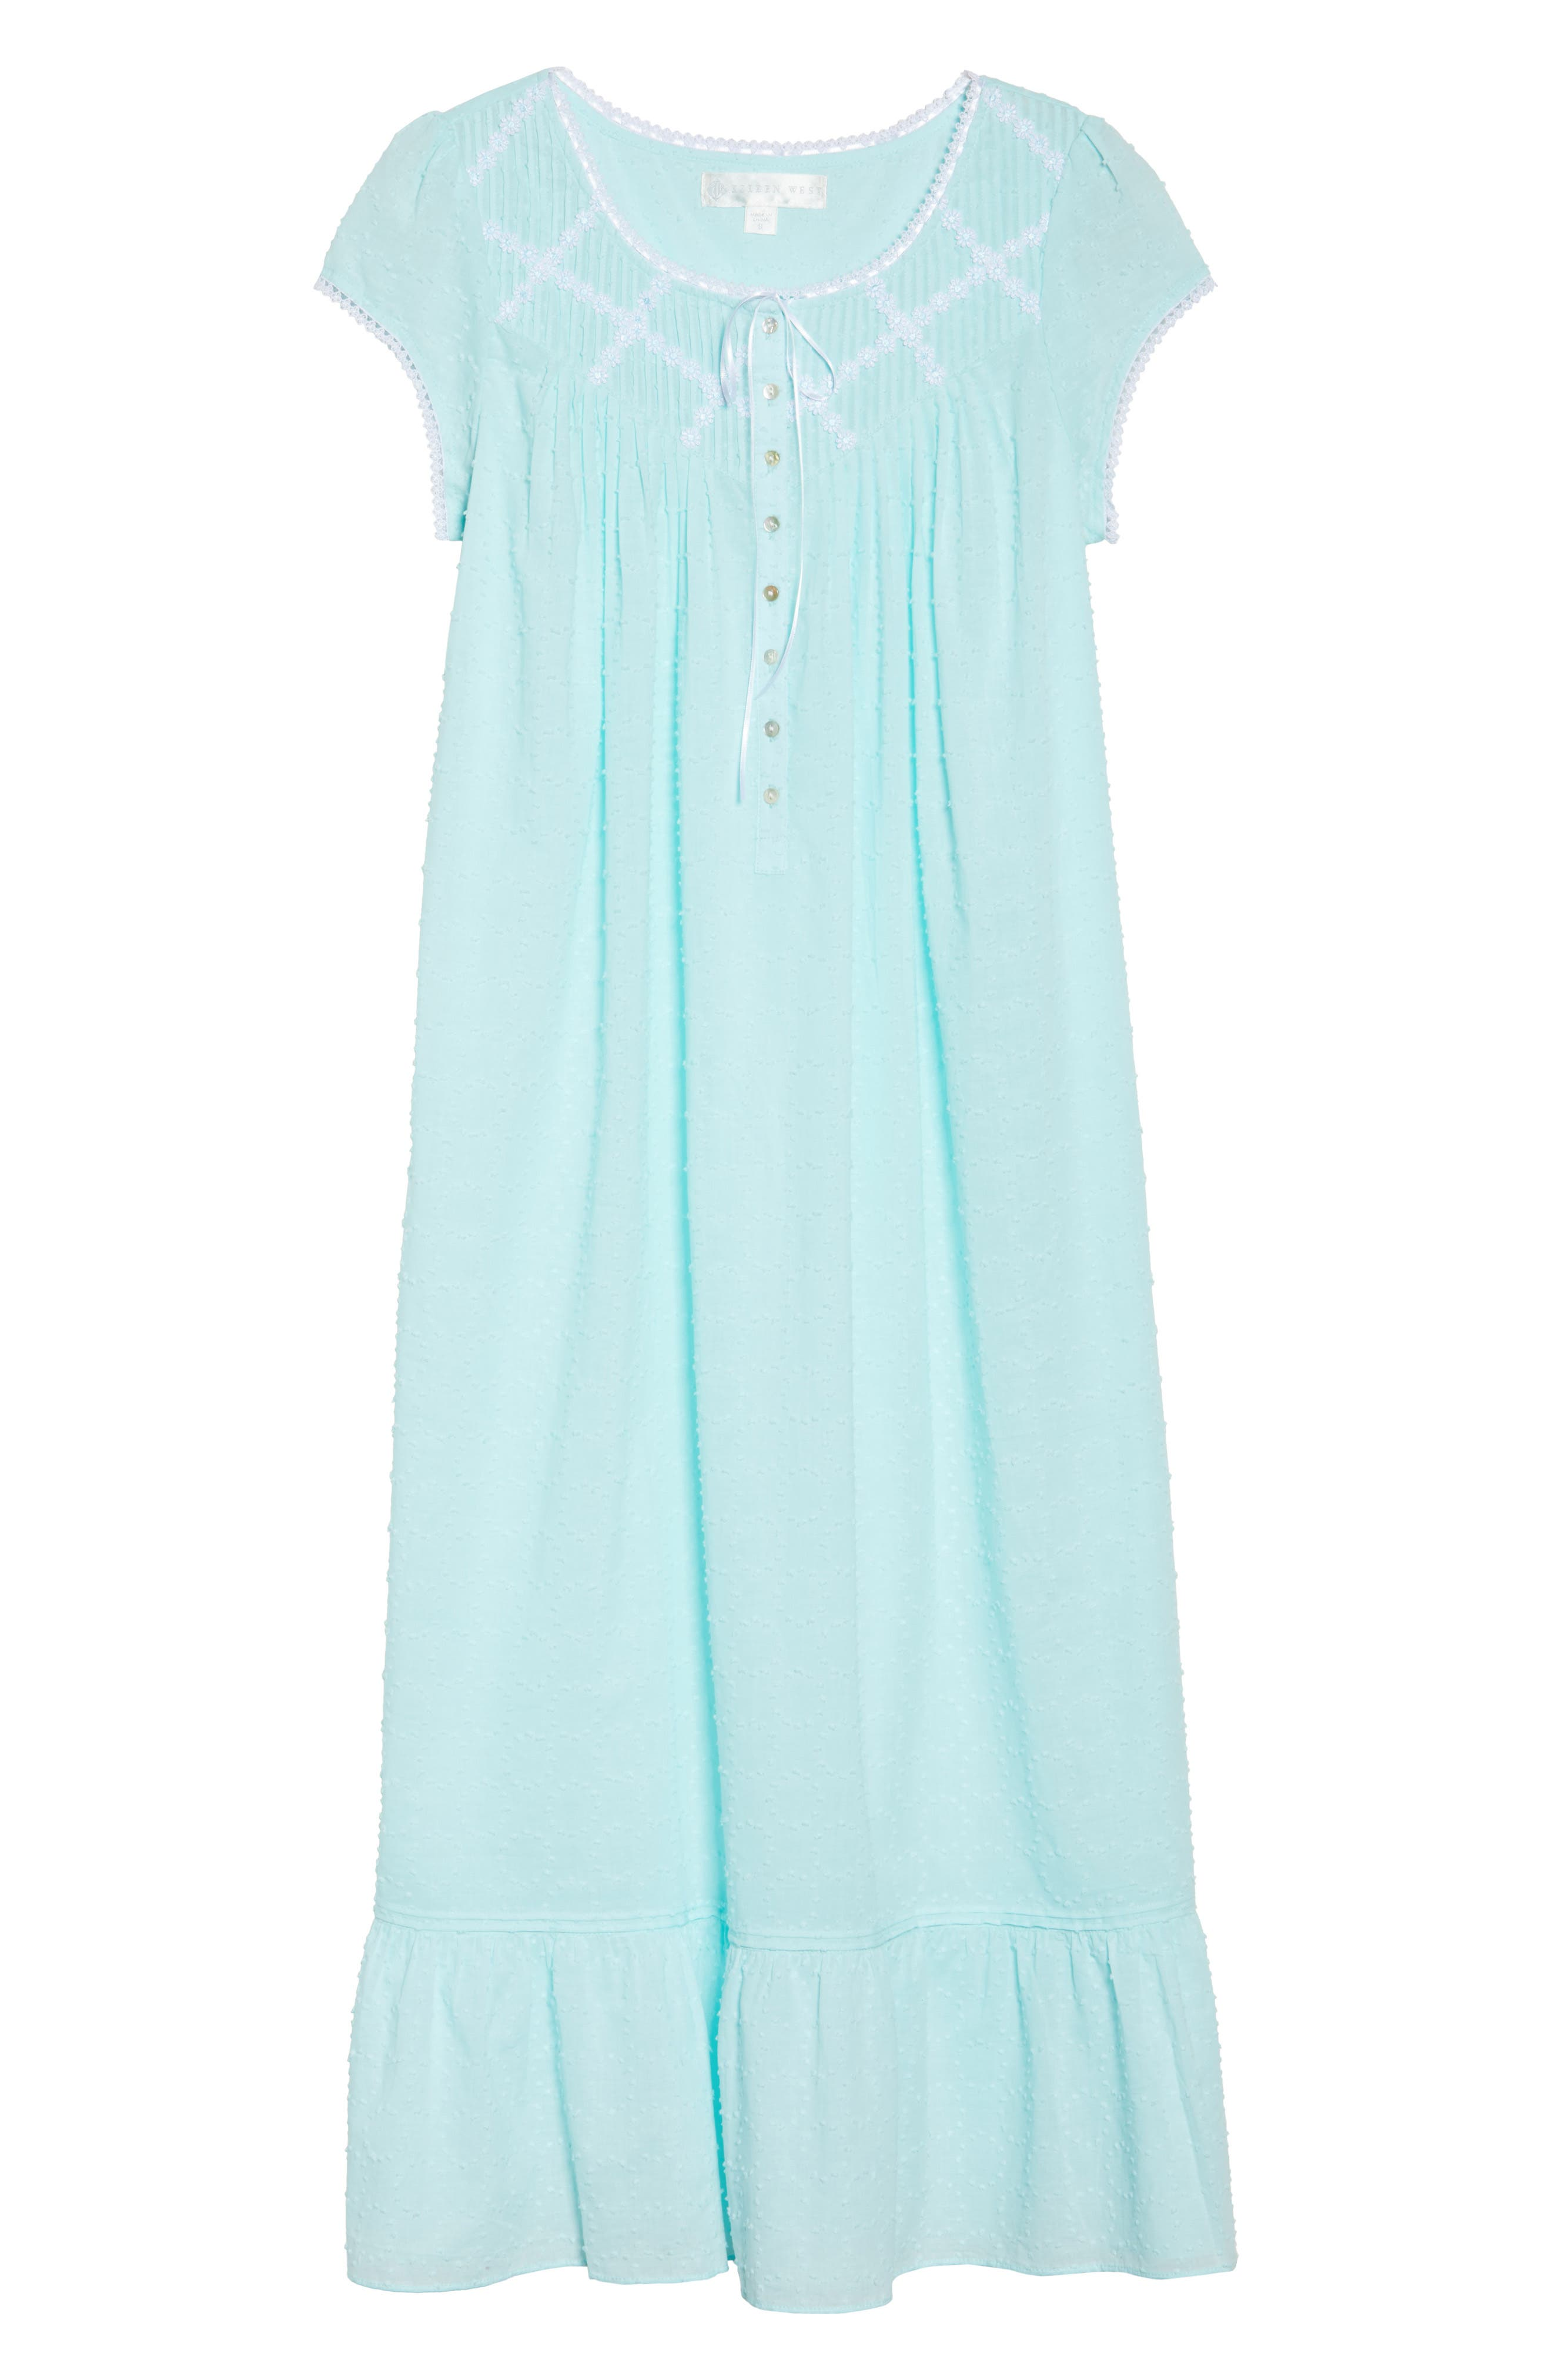 Cotton Ballet Nightgown,                             Alternate thumbnail 6, color,                             400